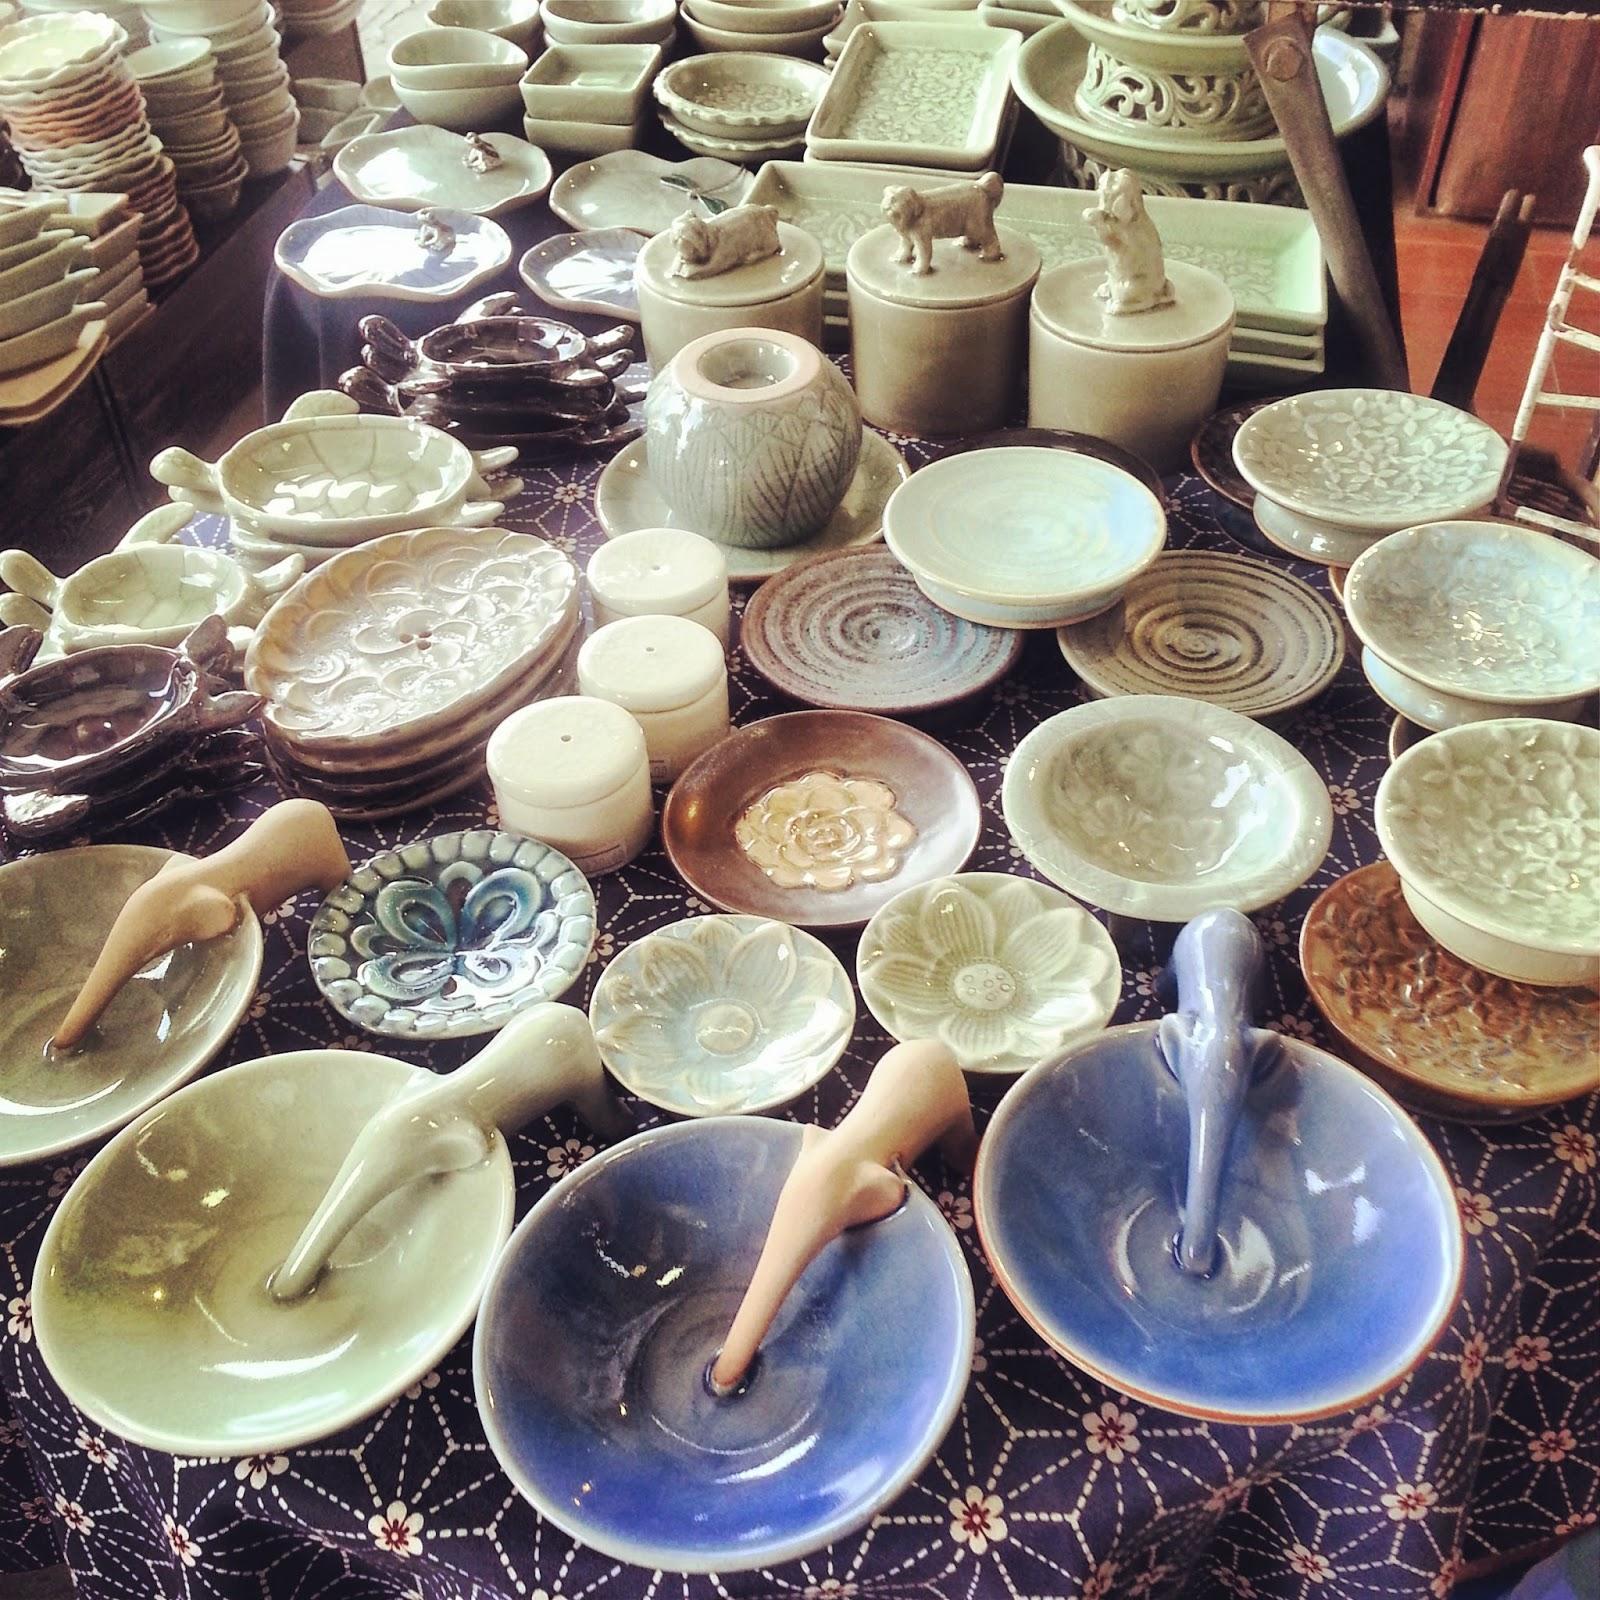 Chatuchak Weekend Market Thailand Story Of Neverland